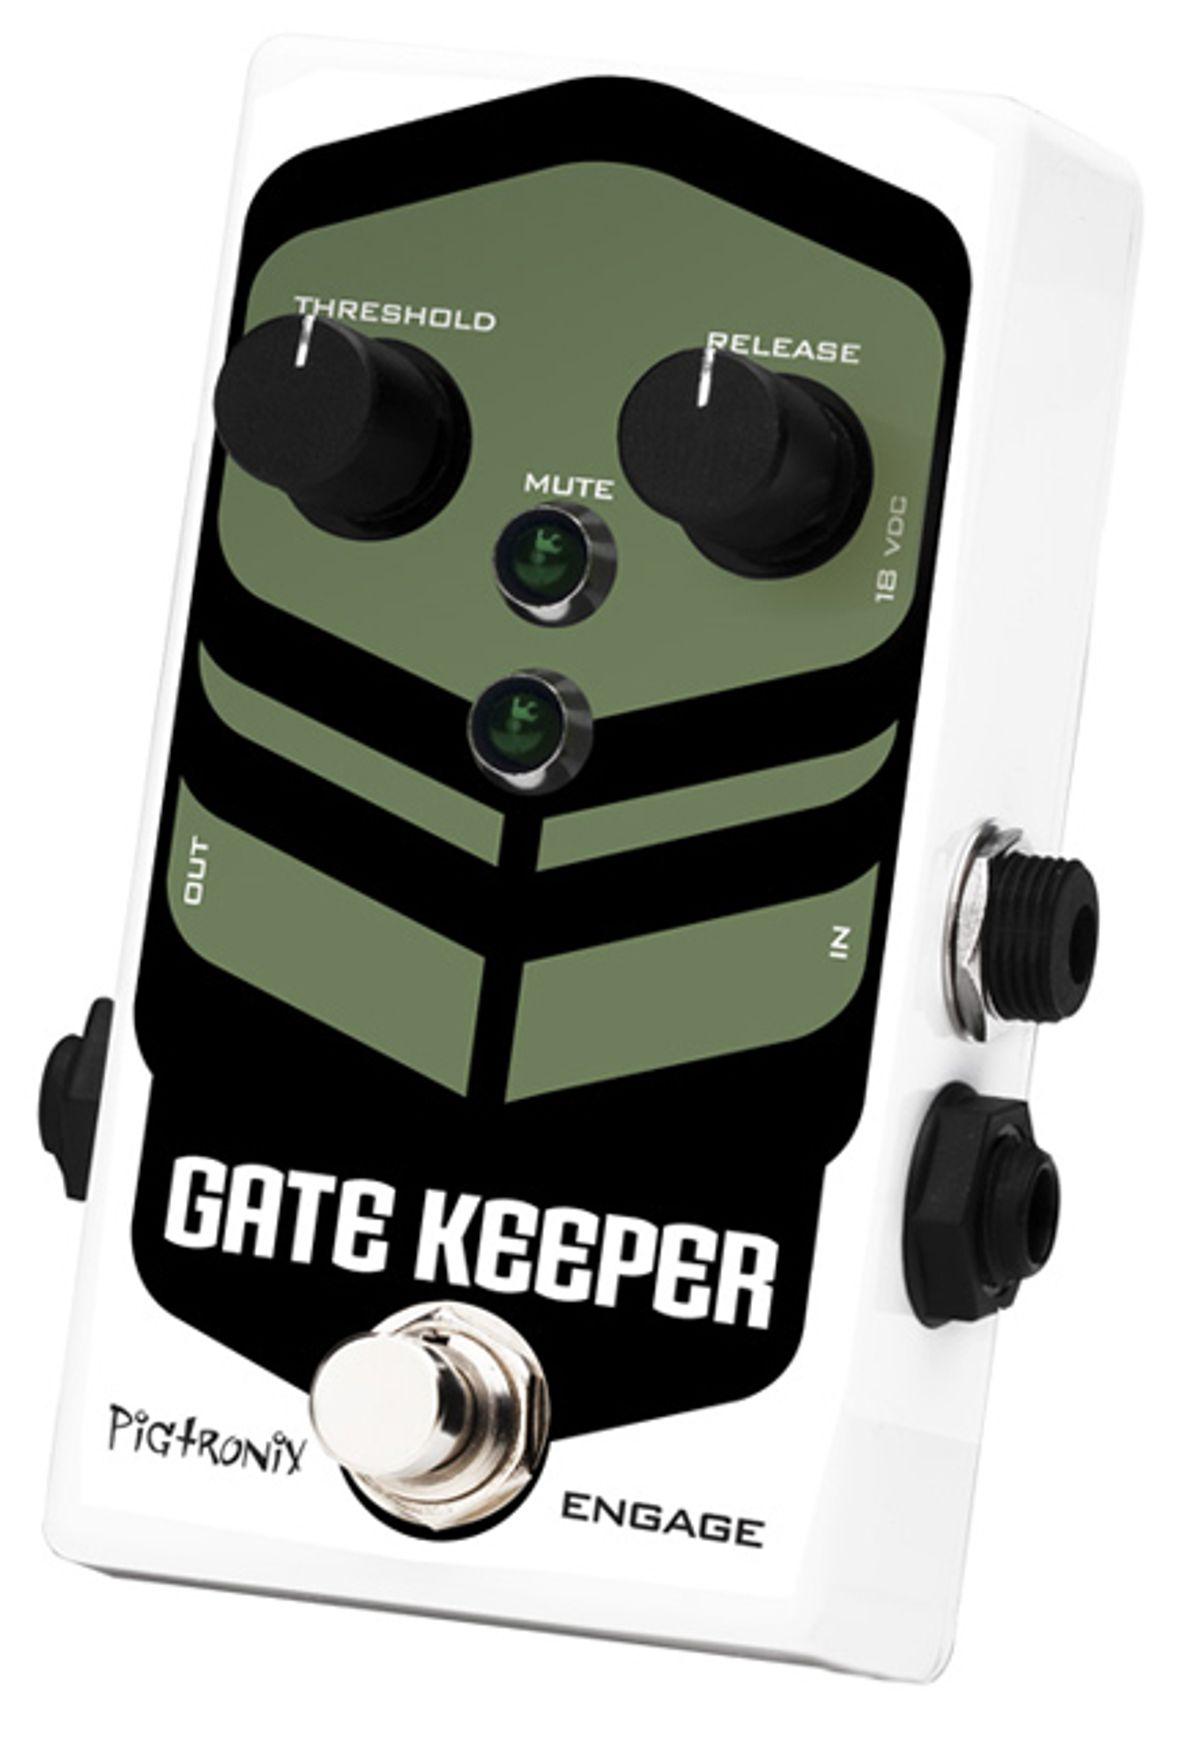 Pigtronix Unveils Gatekeeper Noise Gate